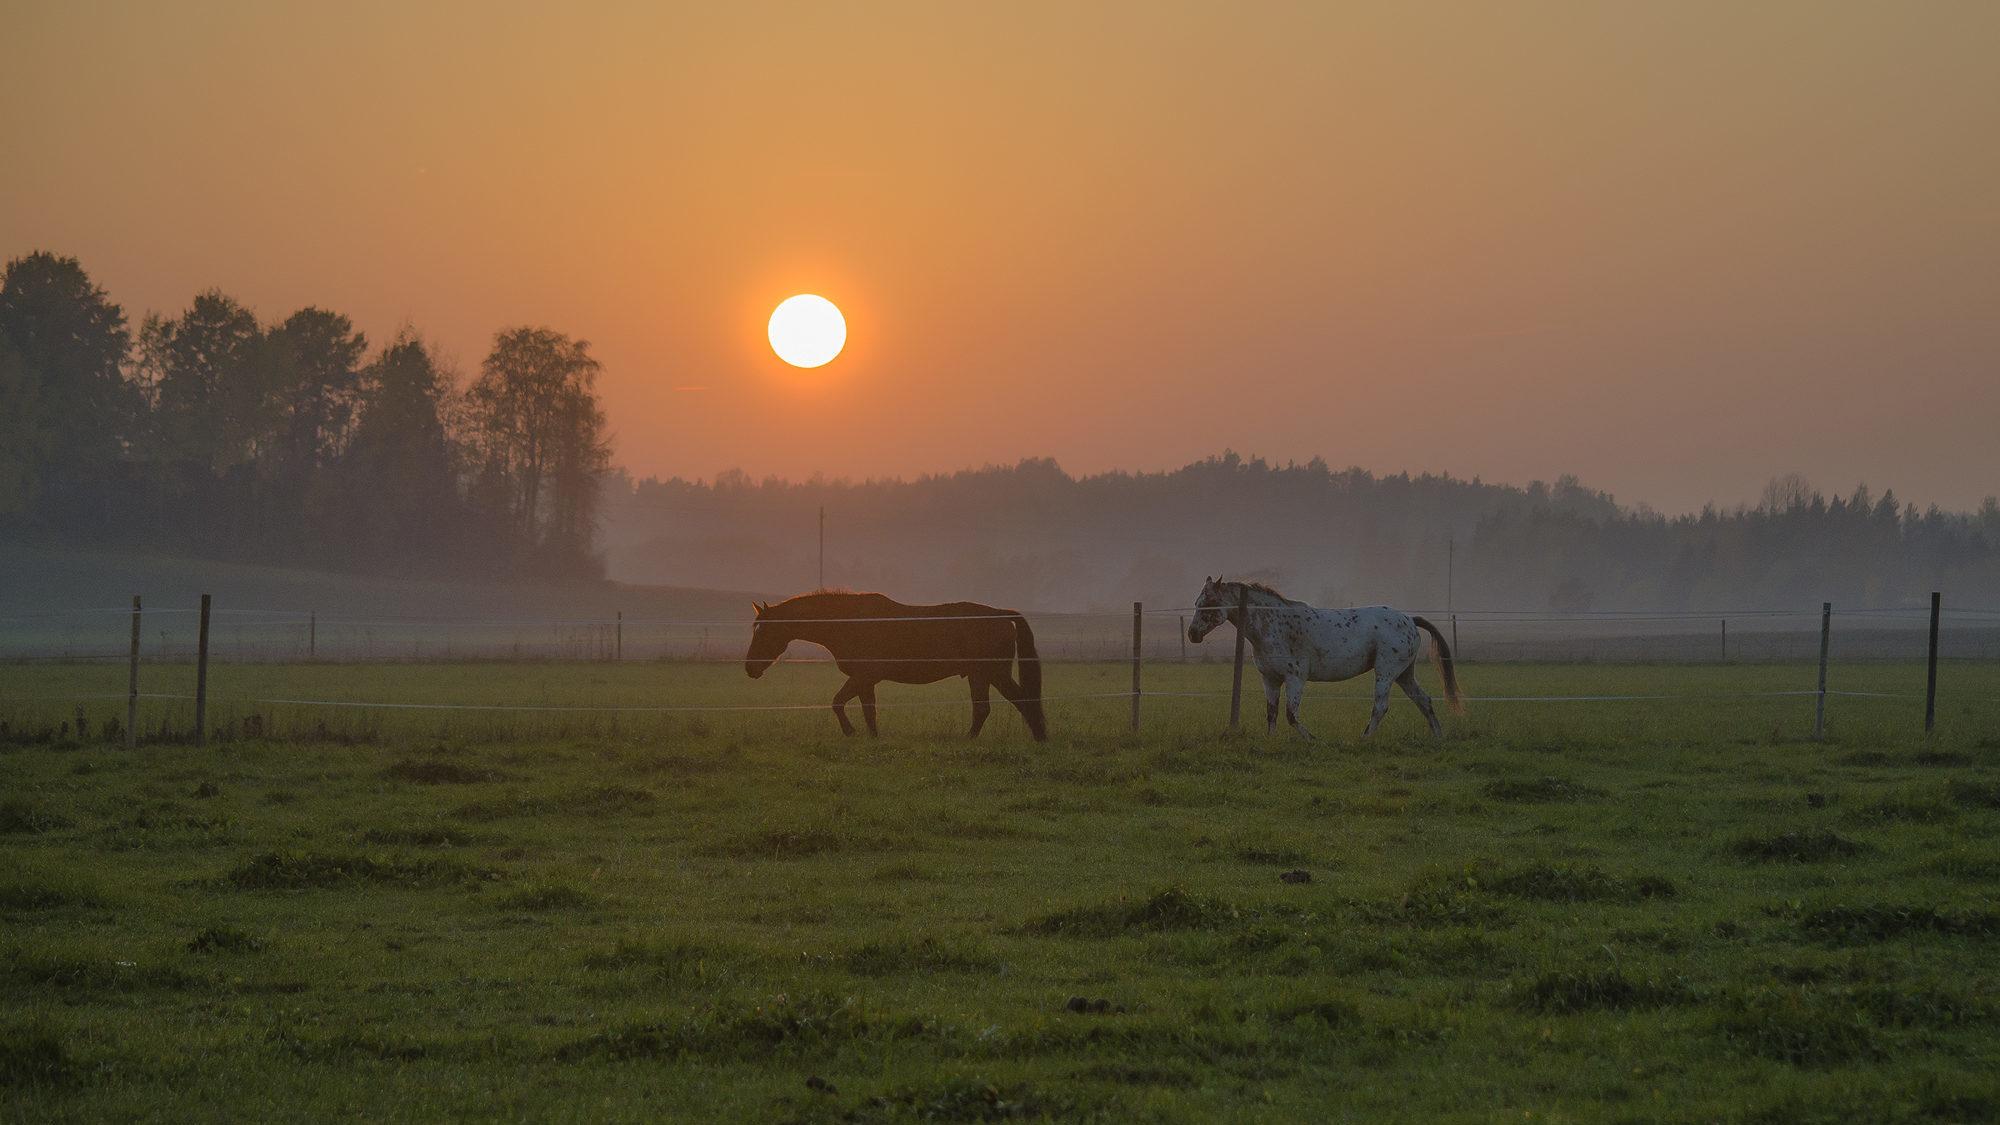 Auringonlasku © Kinttu Koipijärvi